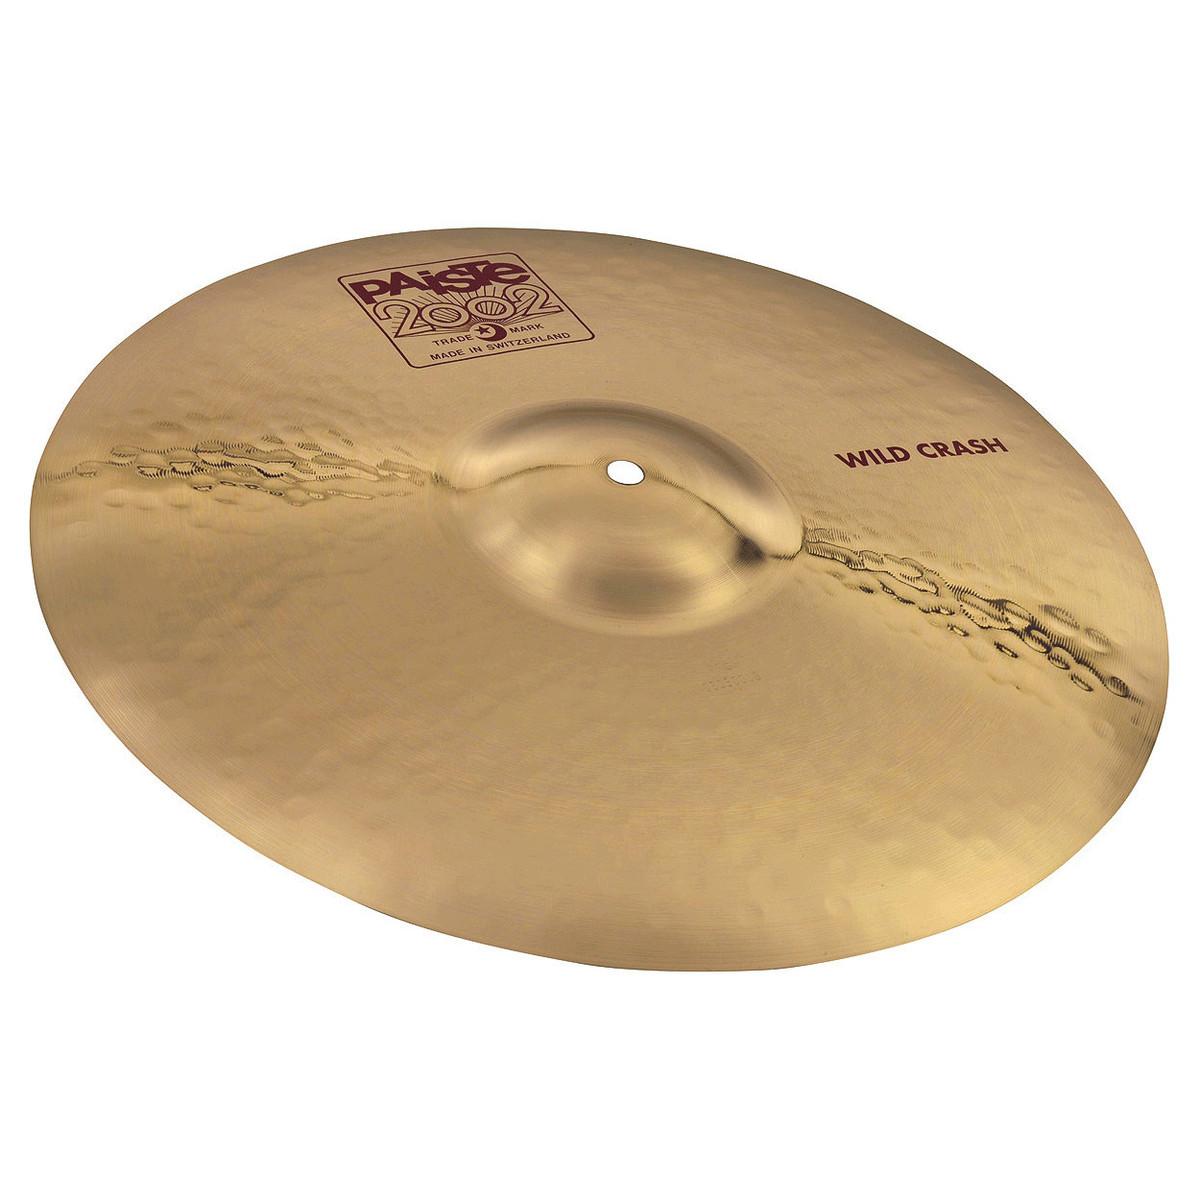 paiste 2002 20 39 39 wild crash cymbal at gear4music. Black Bedroom Furniture Sets. Home Design Ideas